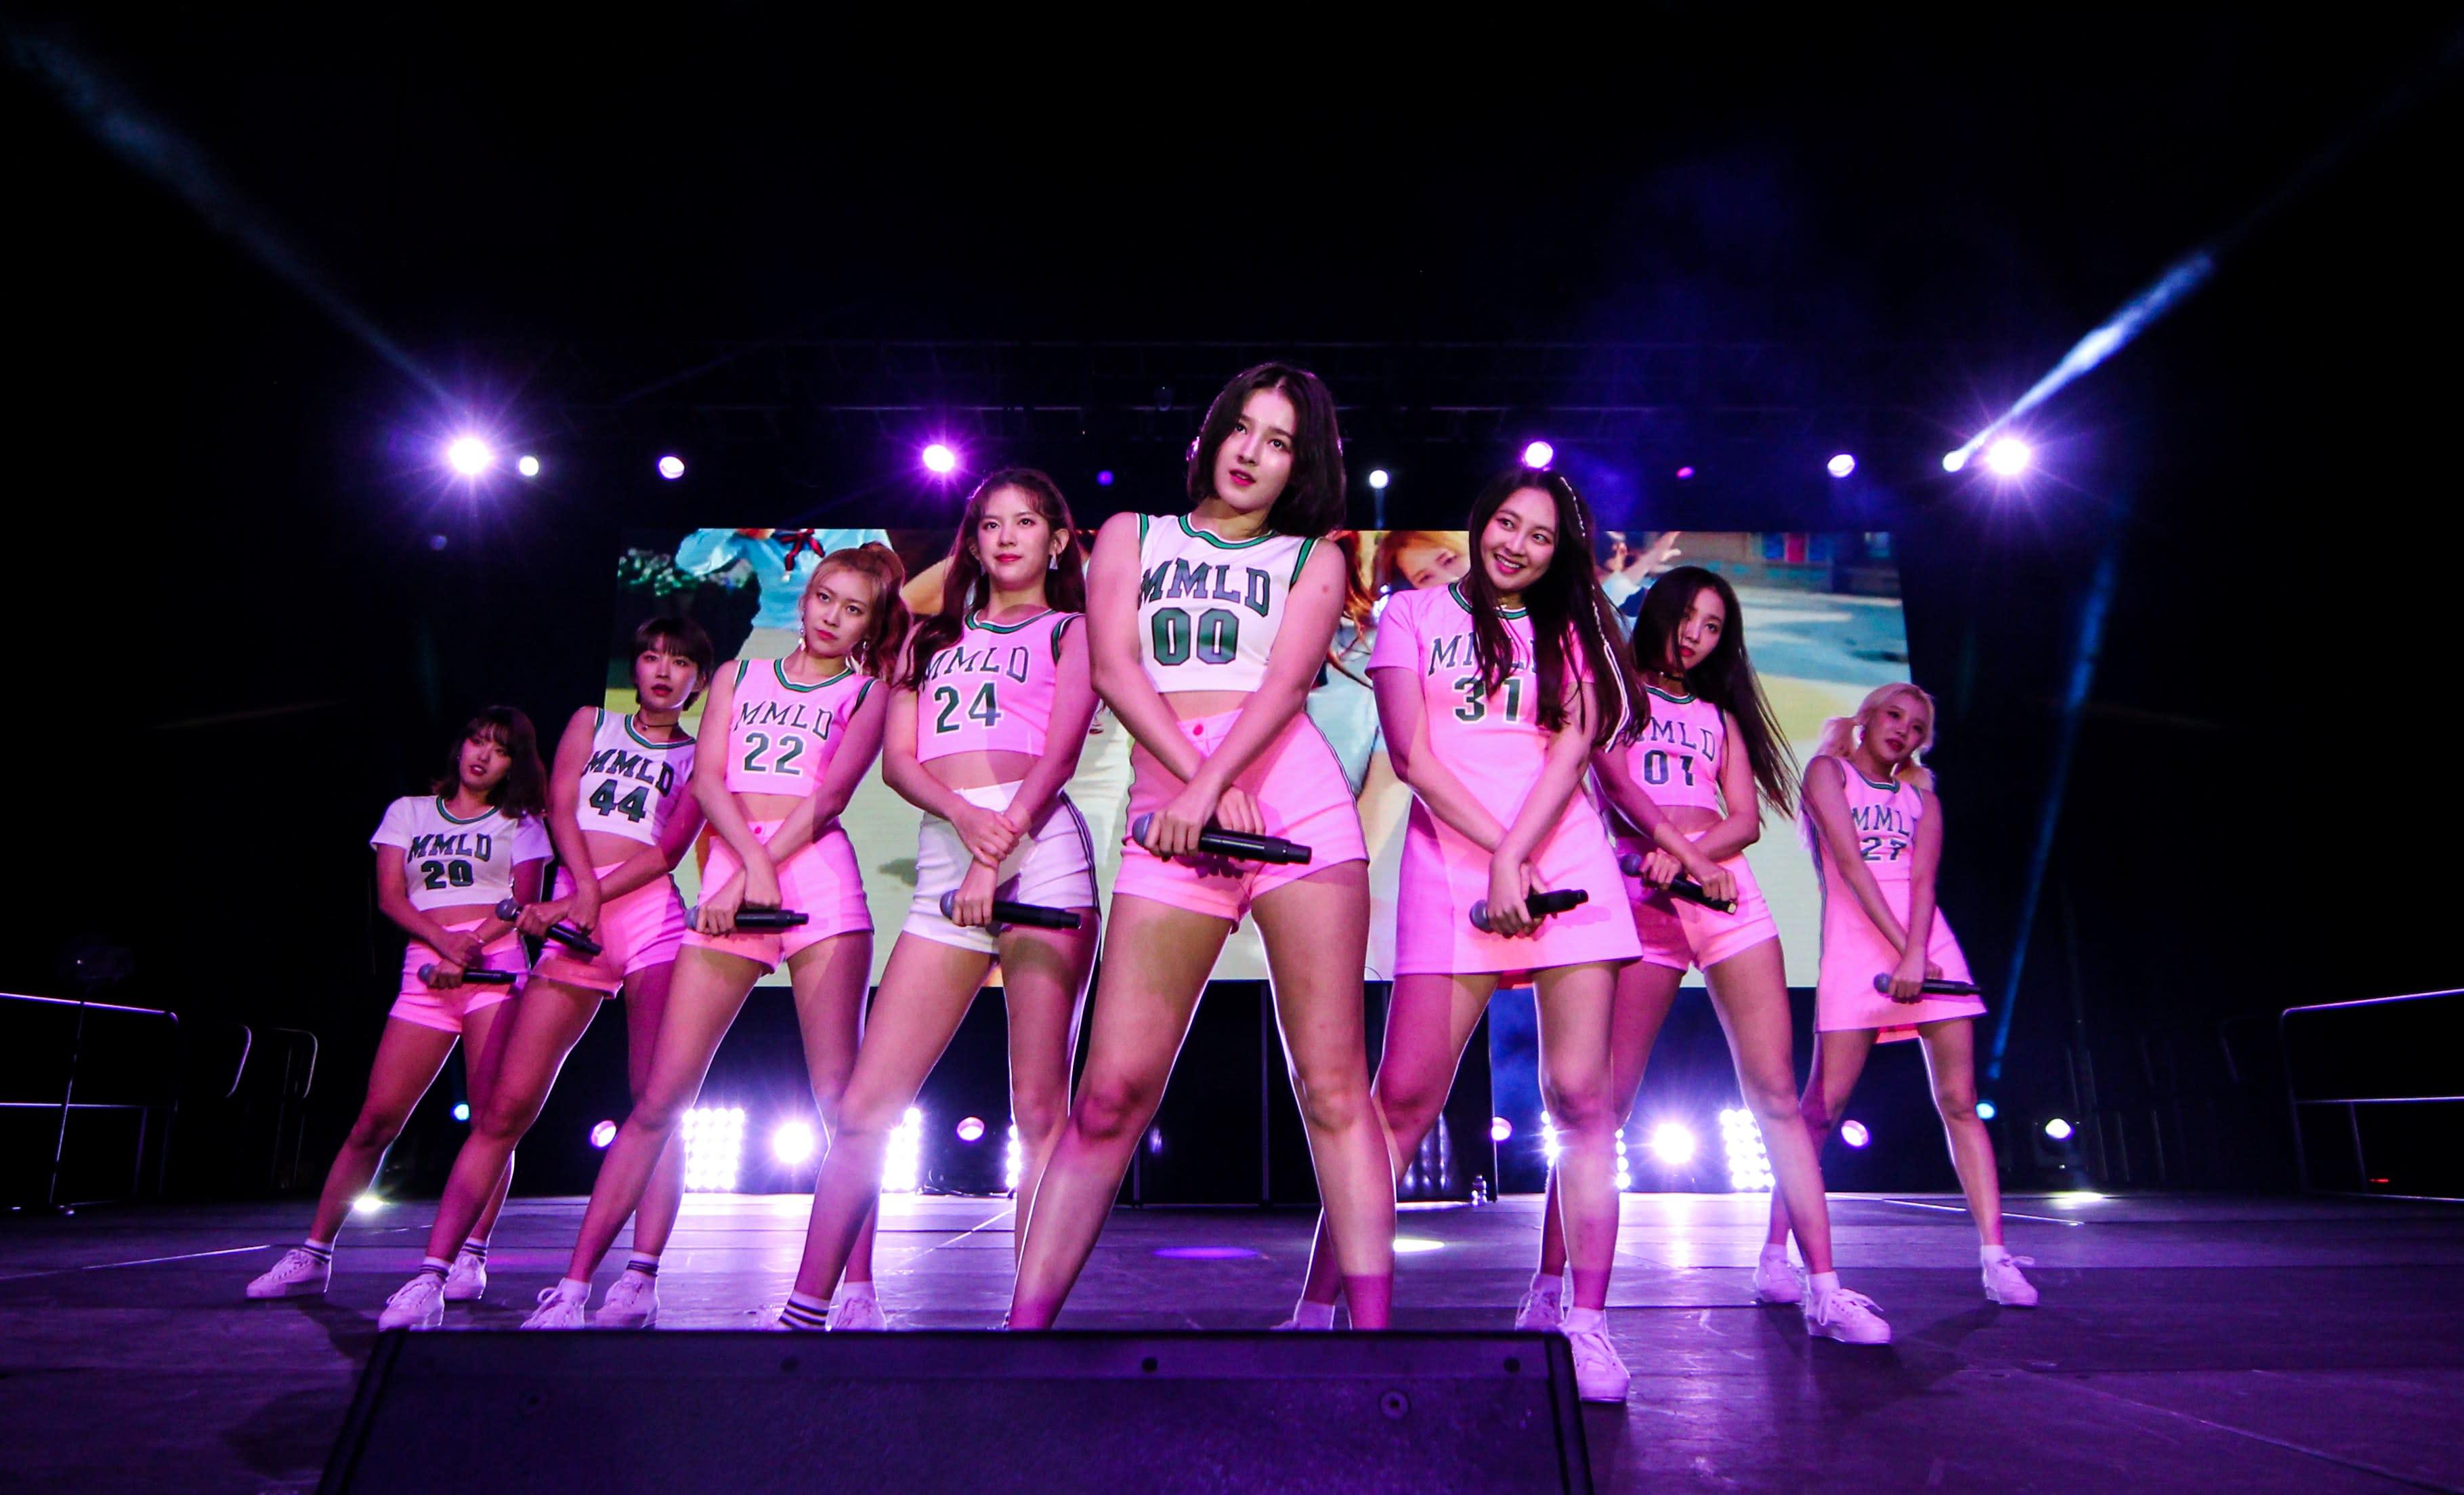 K-Pop Group Momoland Shares the Weirdest Parts of Their